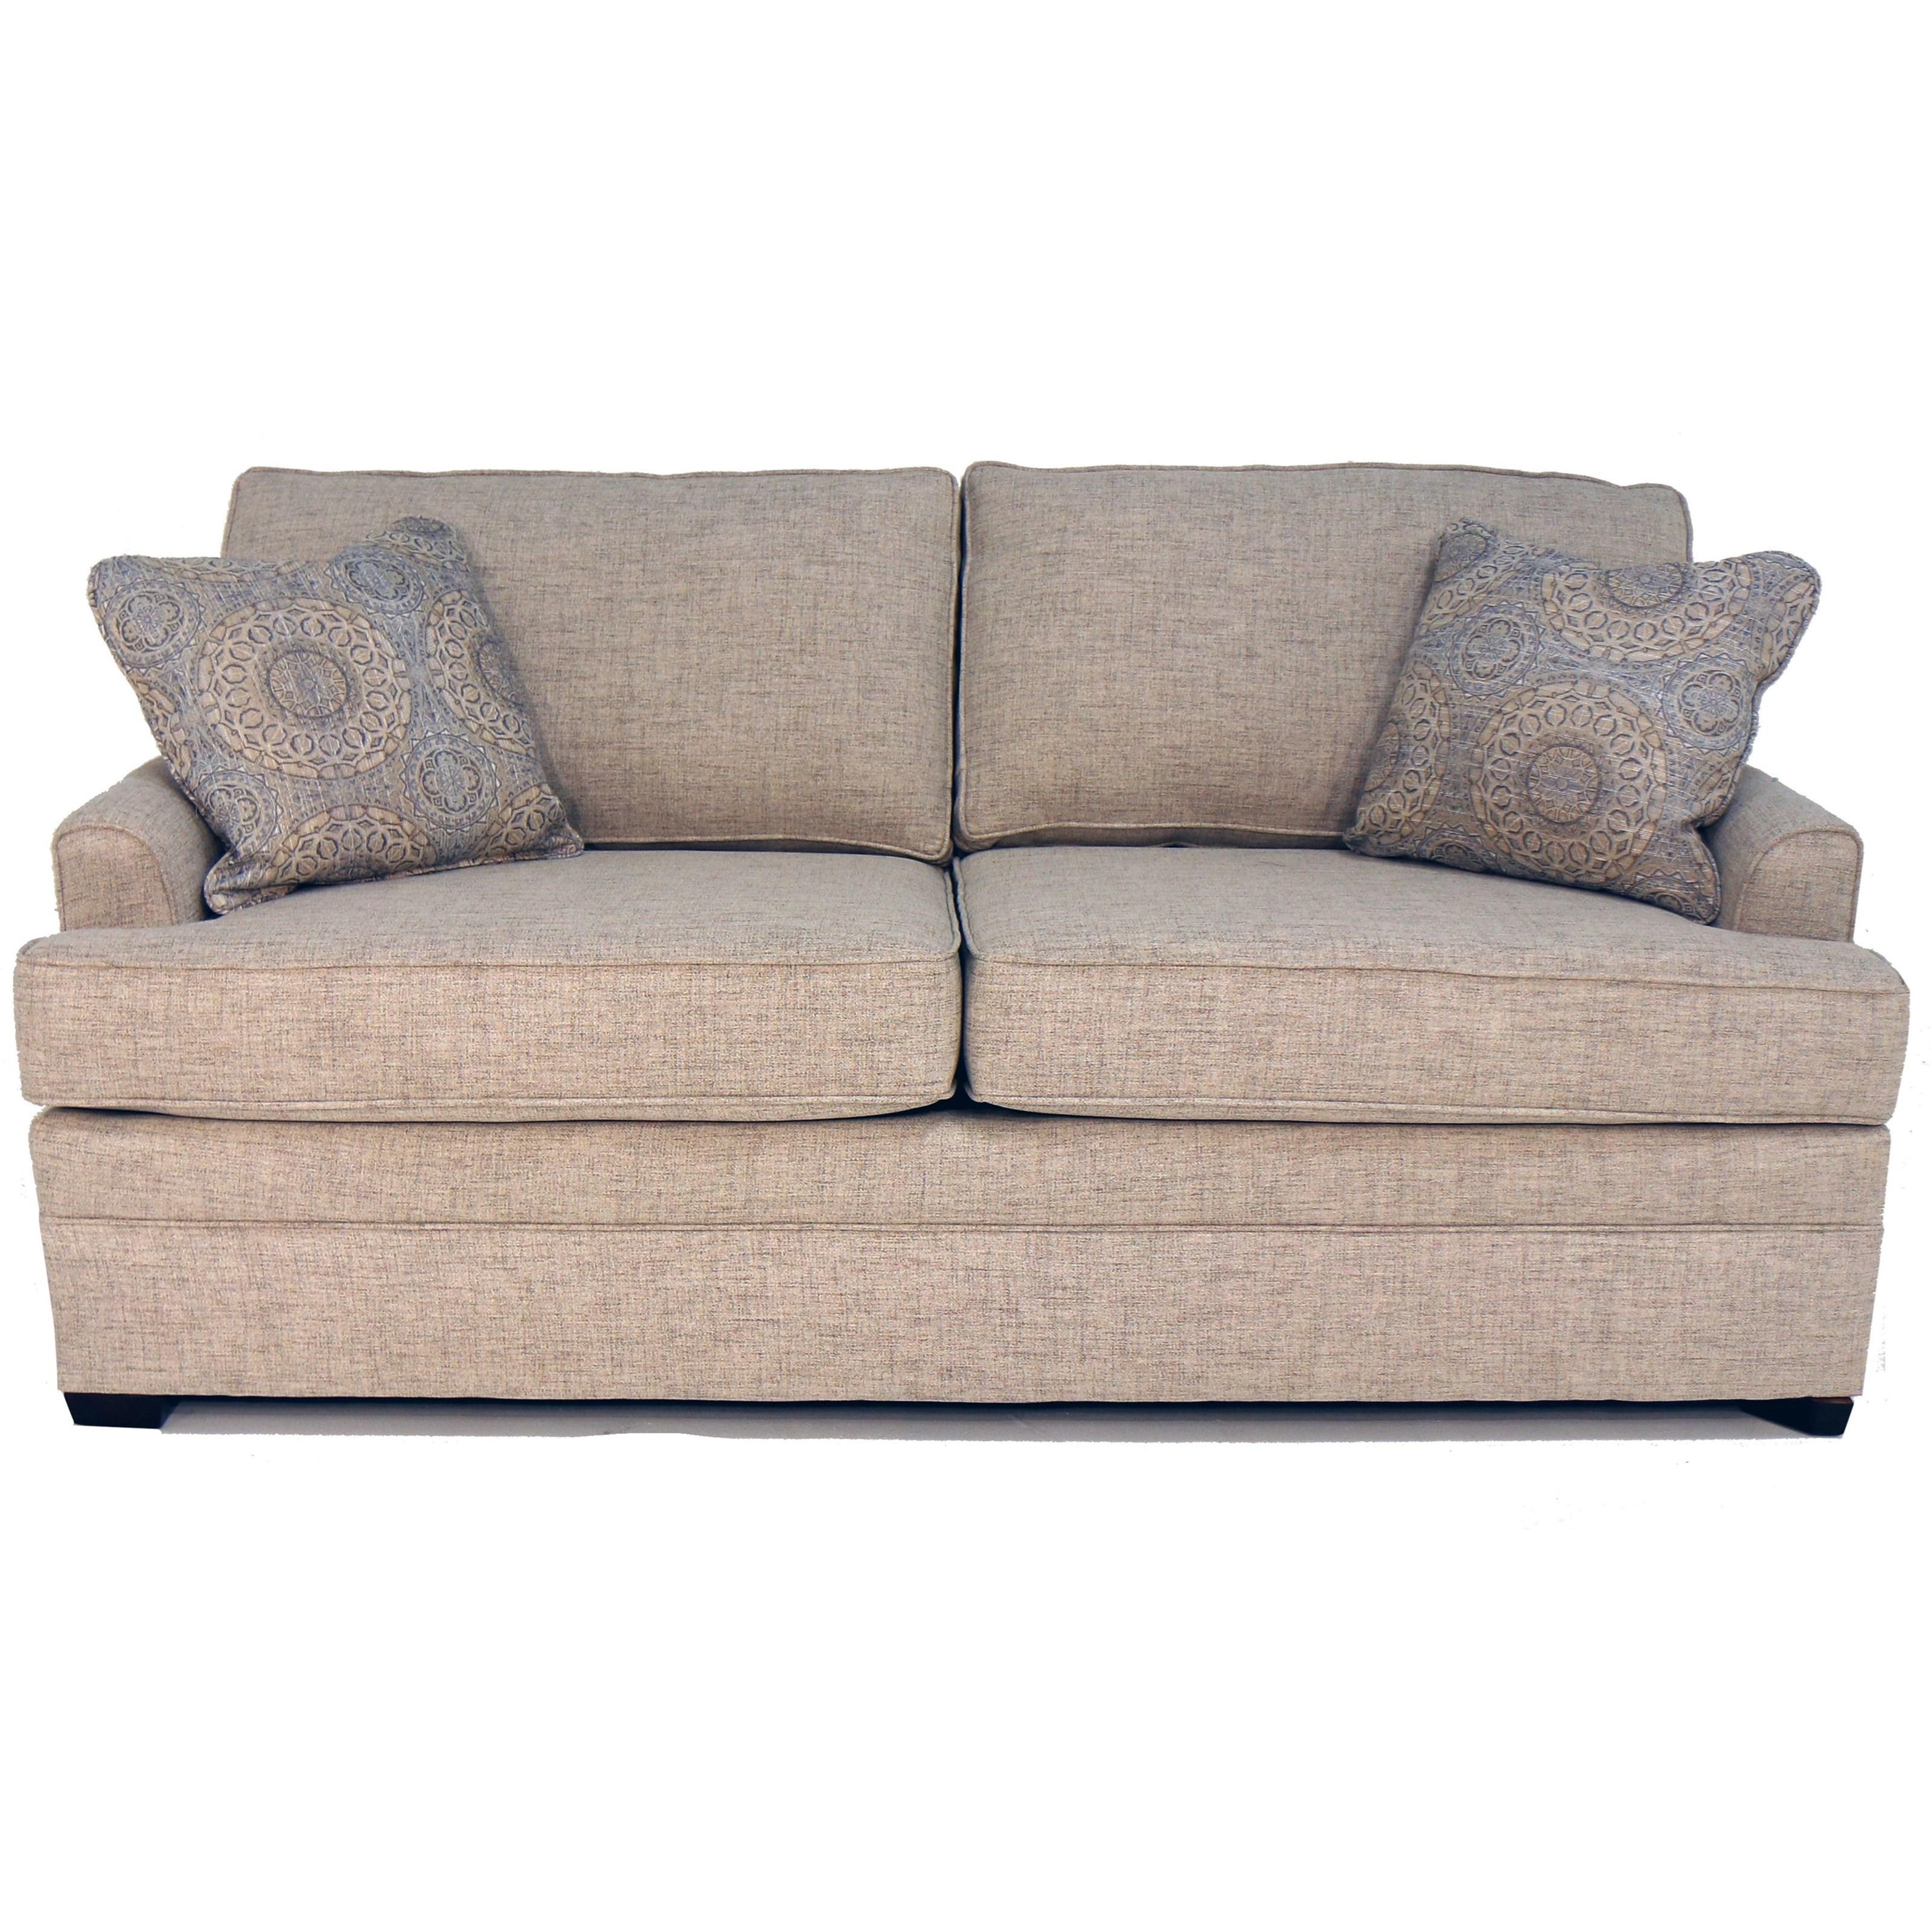 V9R0 Sofa by Alexvale at Steger's Furniture